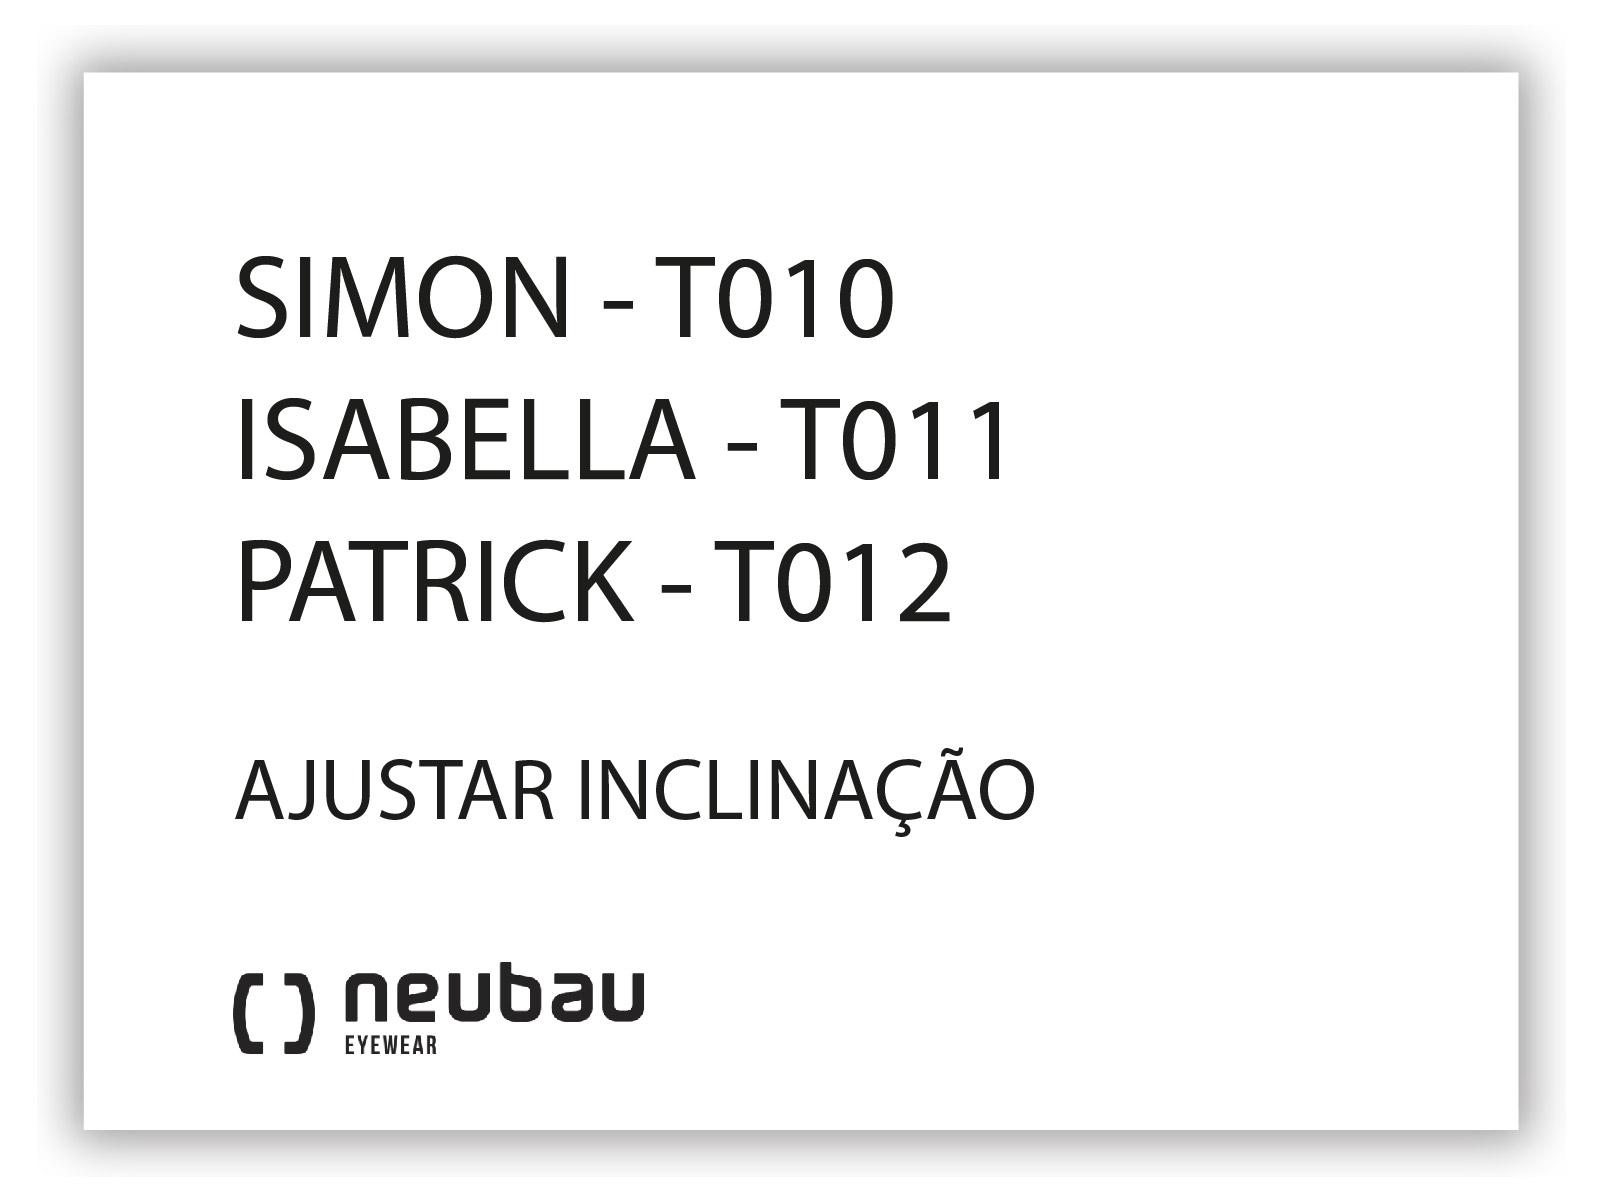 NEUBAU_T010, T011, T012-INCL